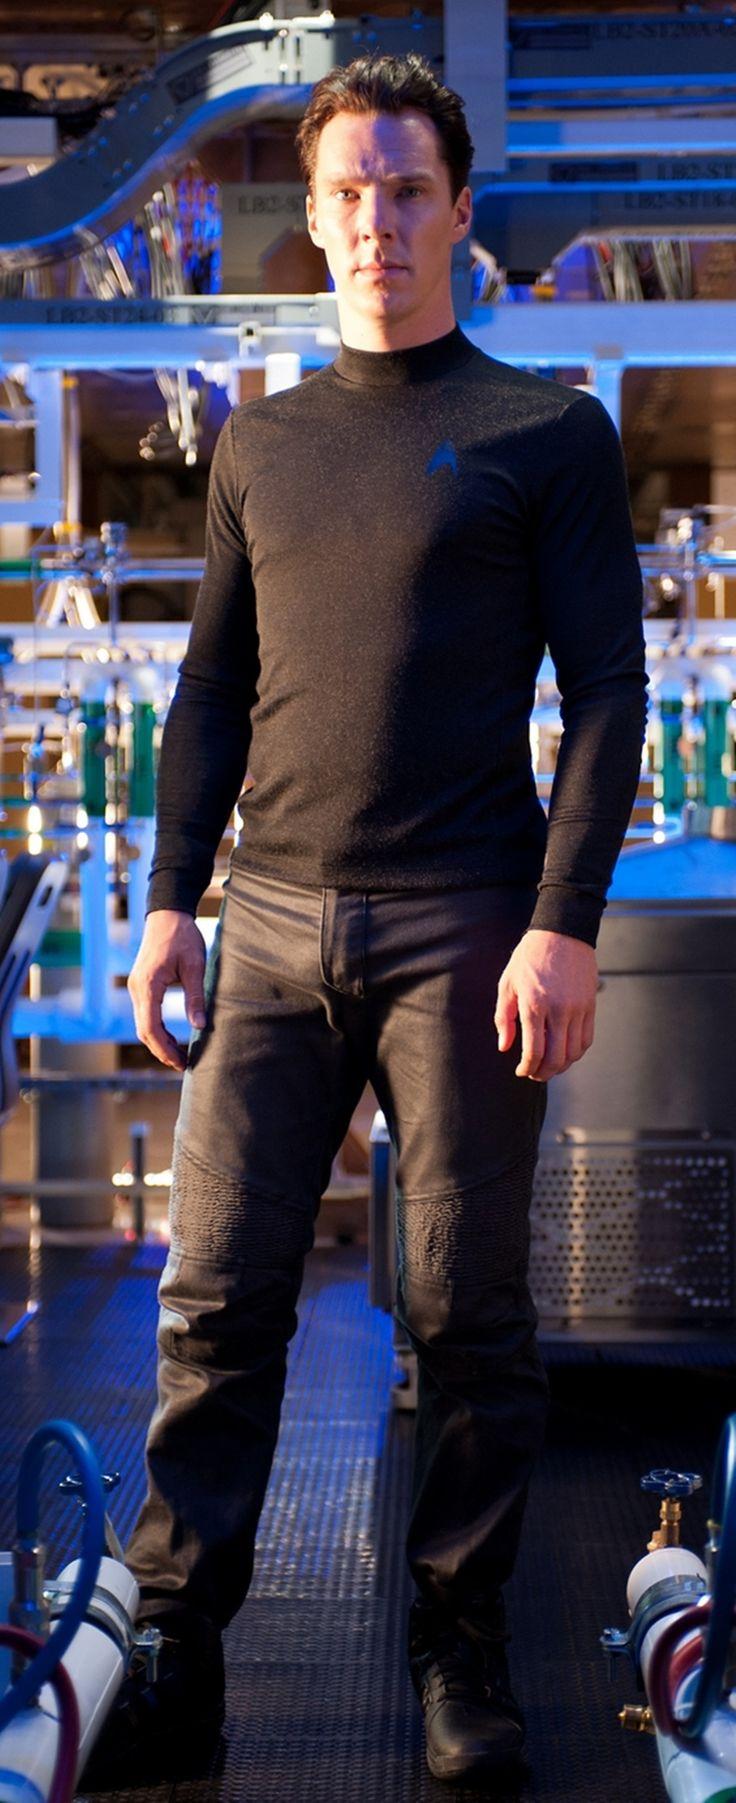 Benedict Cumberbatch Holy Khan he's hot